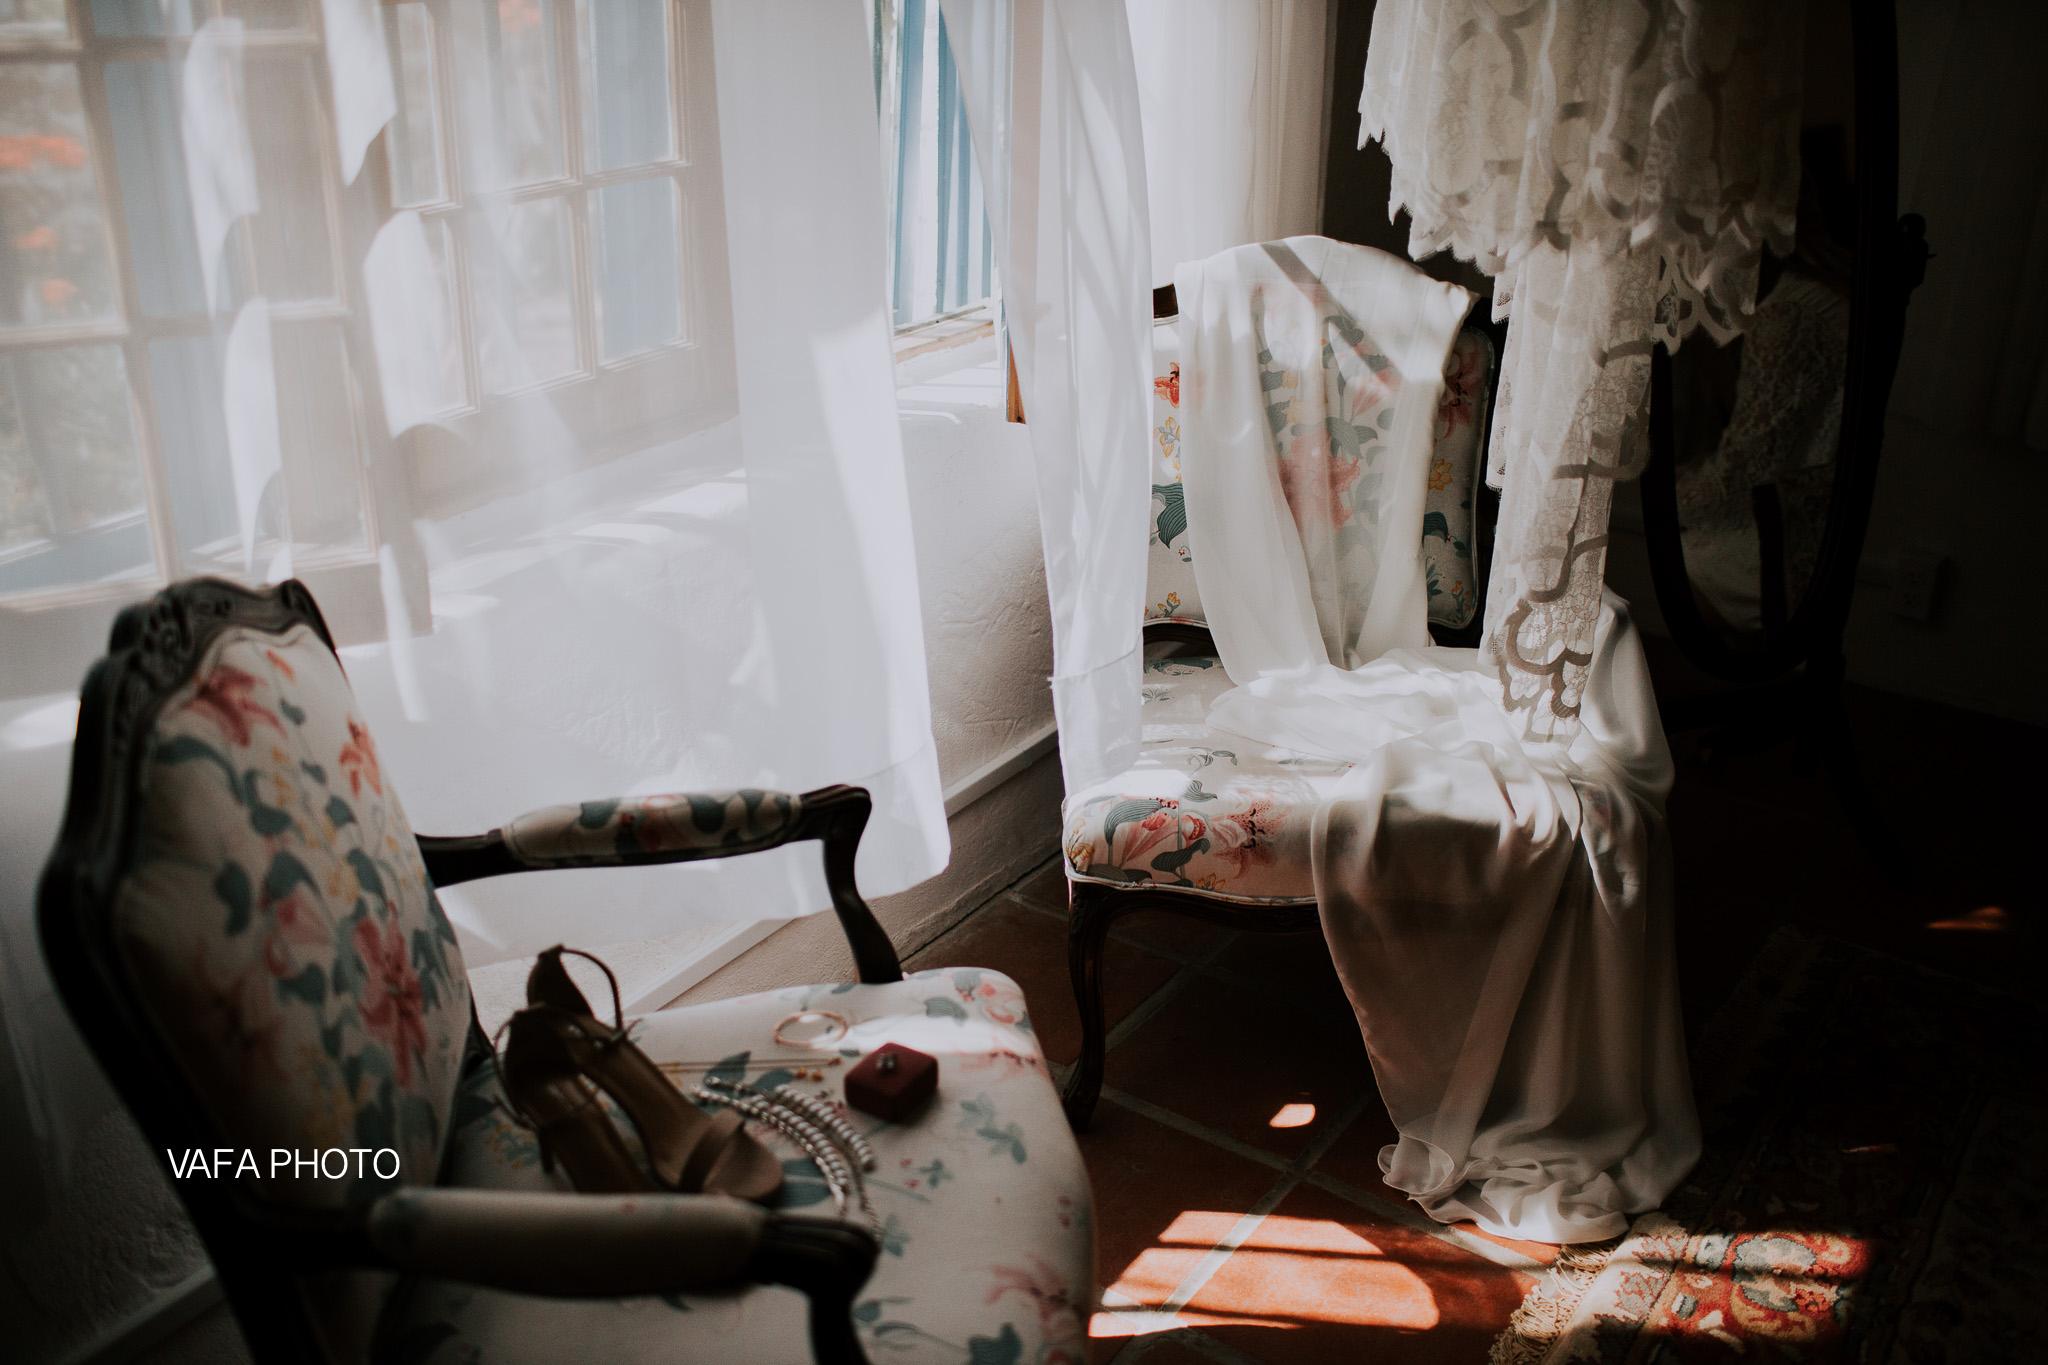 Leo-Carrillo-Ranch-Wedding-Lauren-Mike-Vafa-Photo-112.jpg